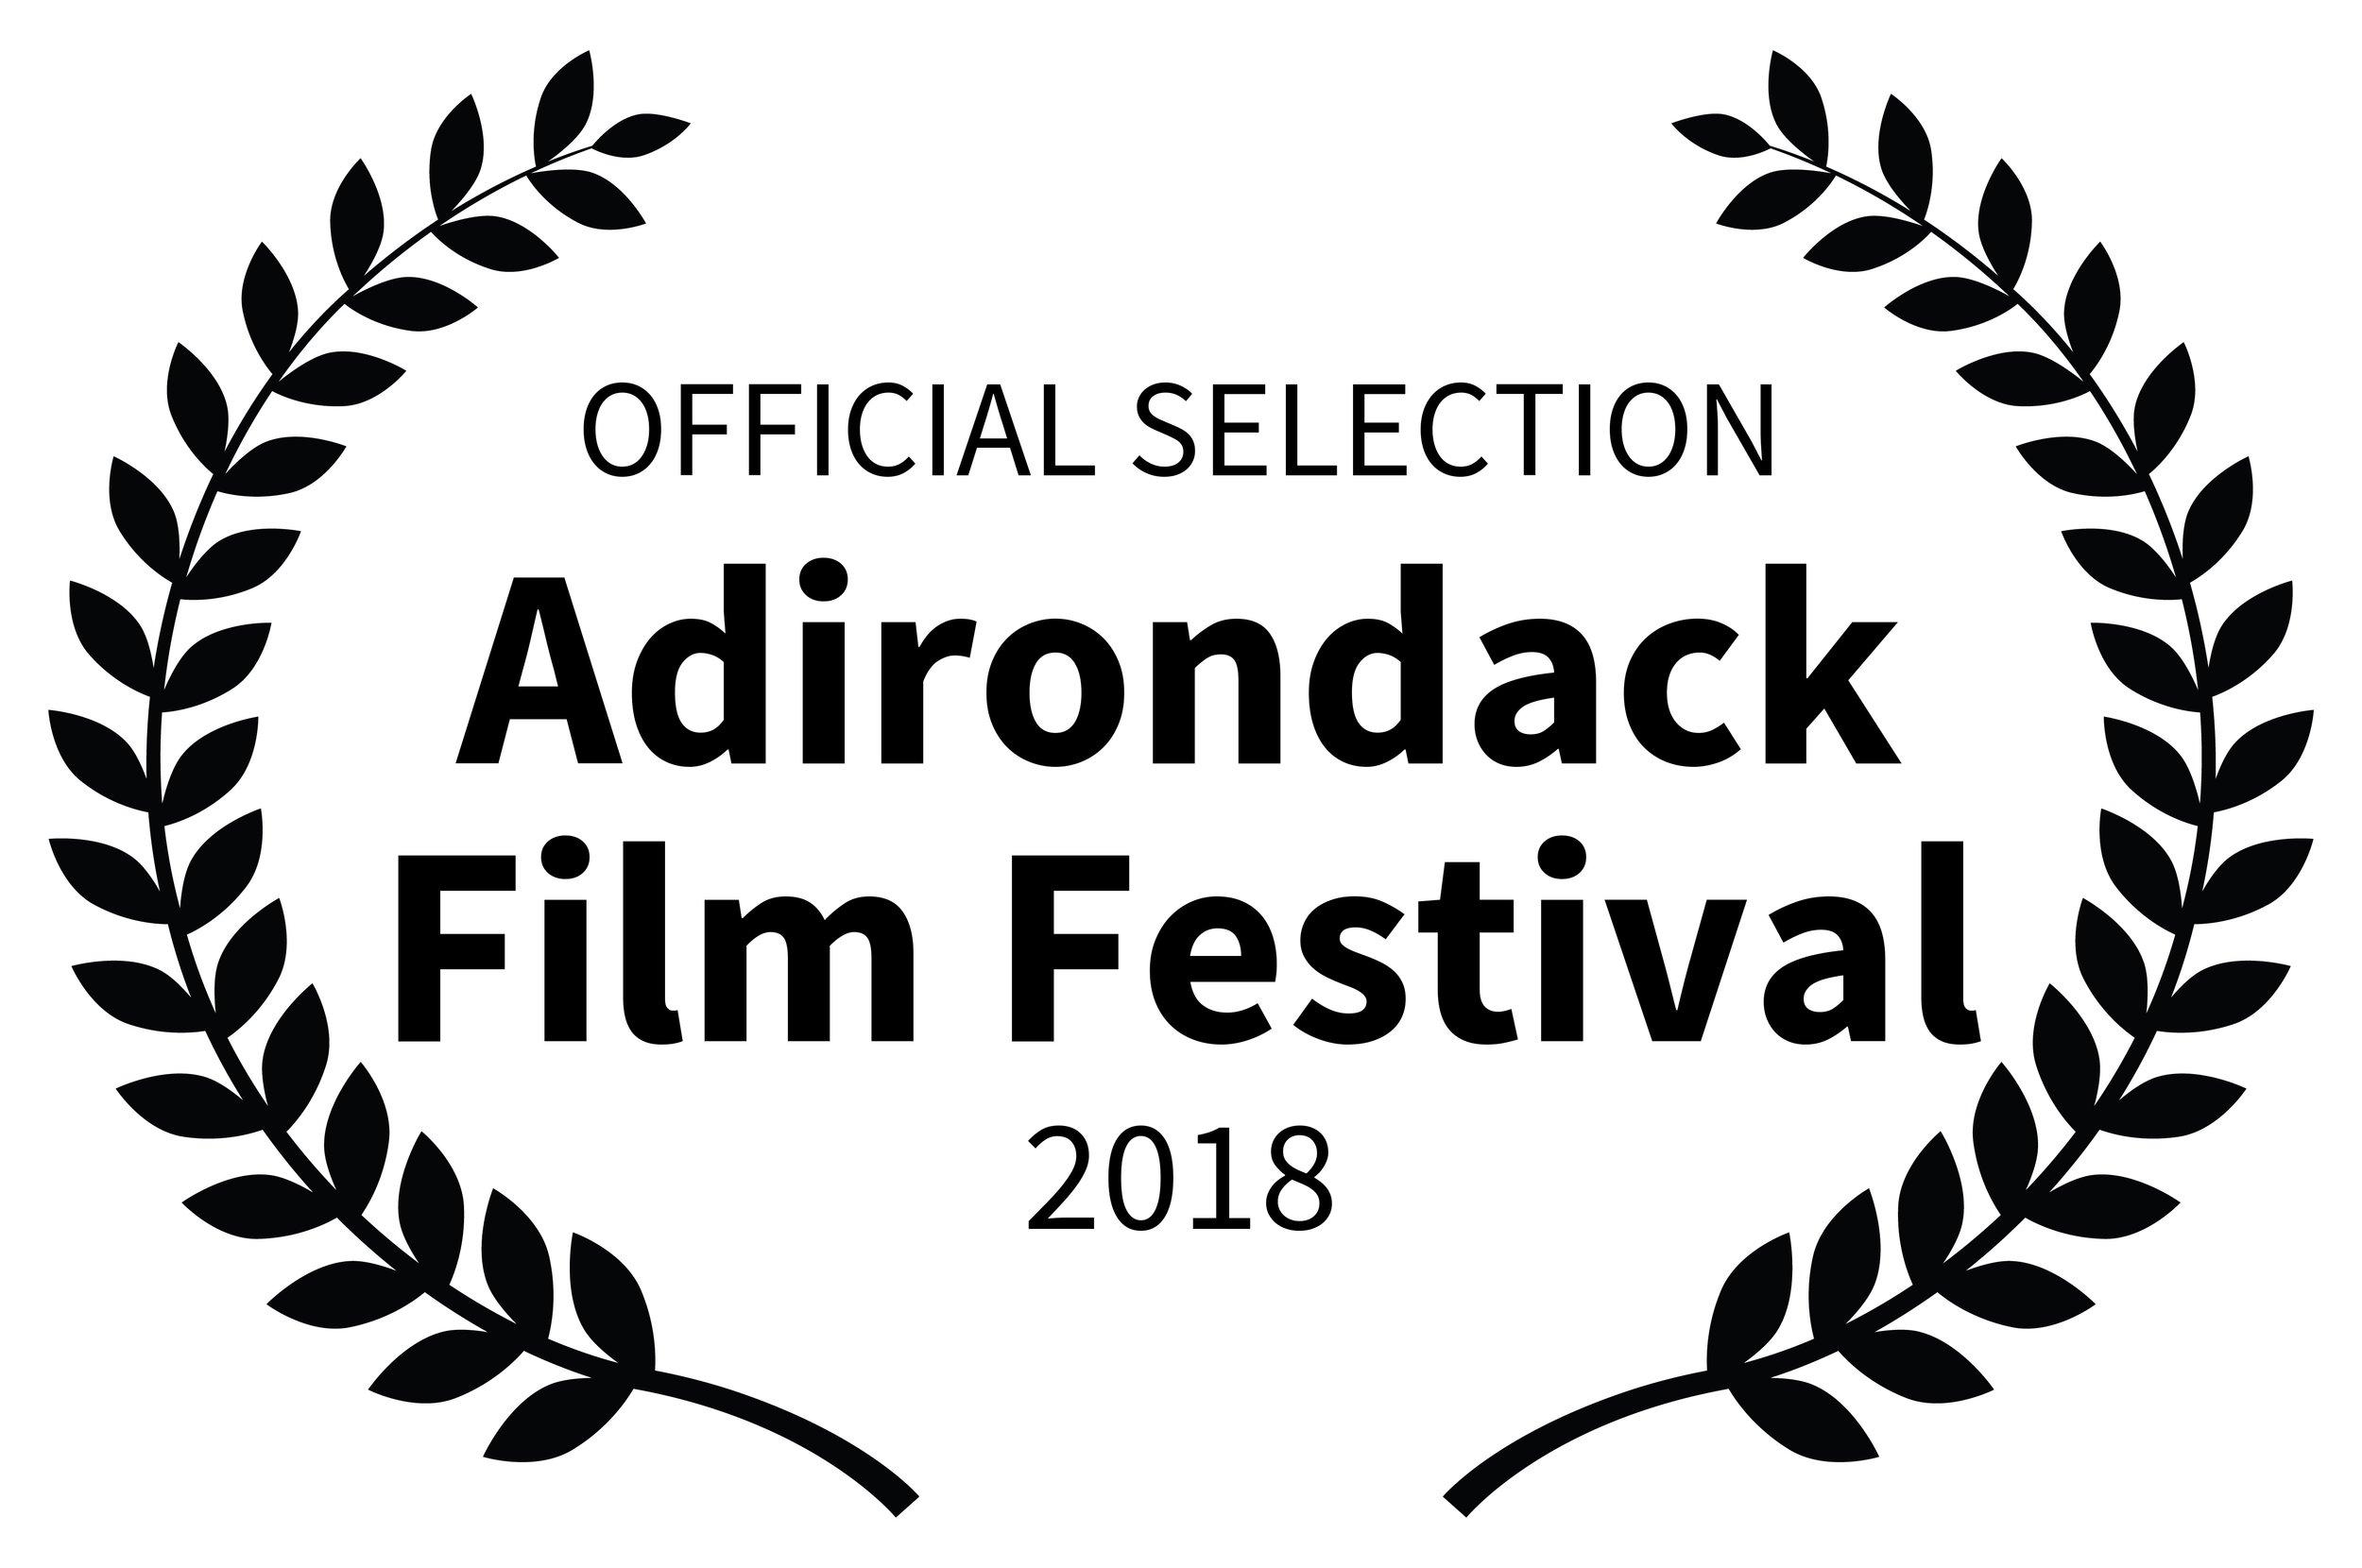 OFFICIALSELECTION-AdirondackFilmFestival-2018.jpg